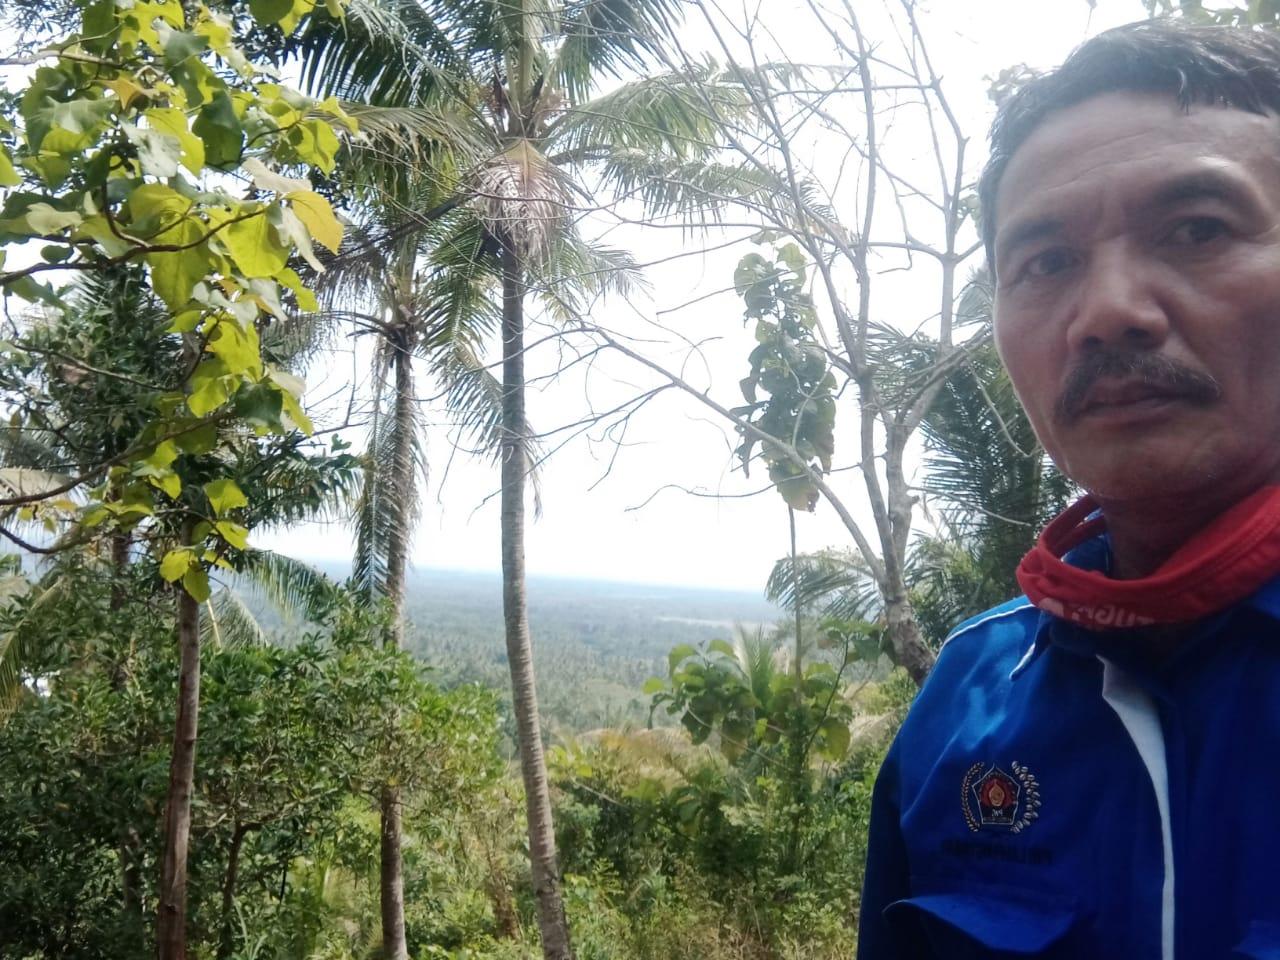 Ropian Kunang, Penggagas Objek Wisata Puncak Tamiang Lampung Timur